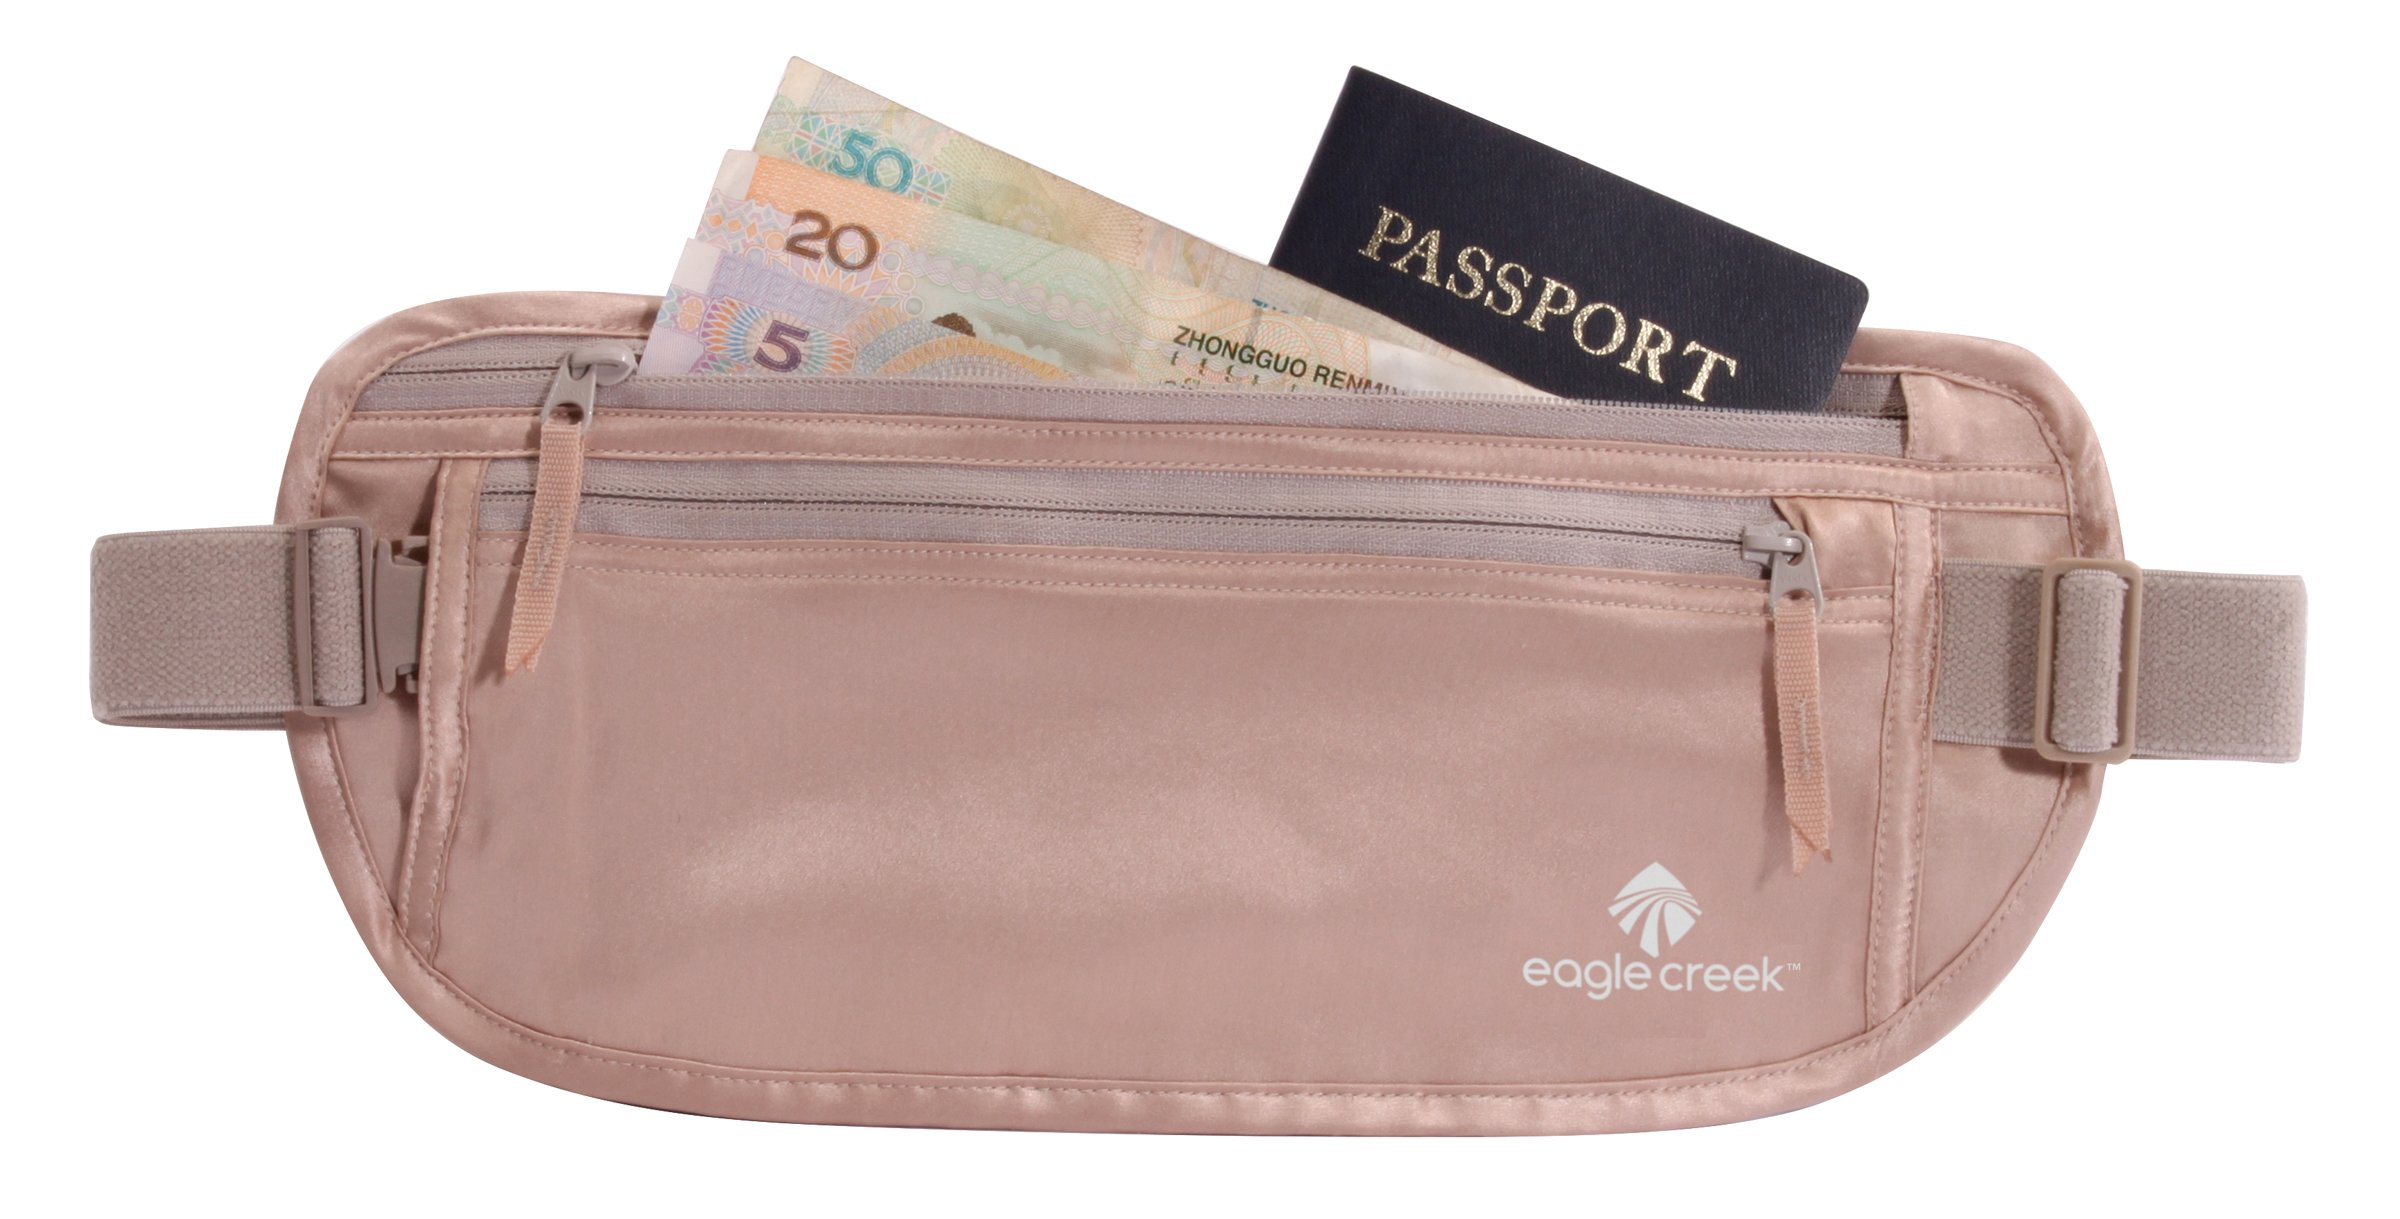 Eagle Creek Silk Undercover Money Belt, Rose by Eagle Creek